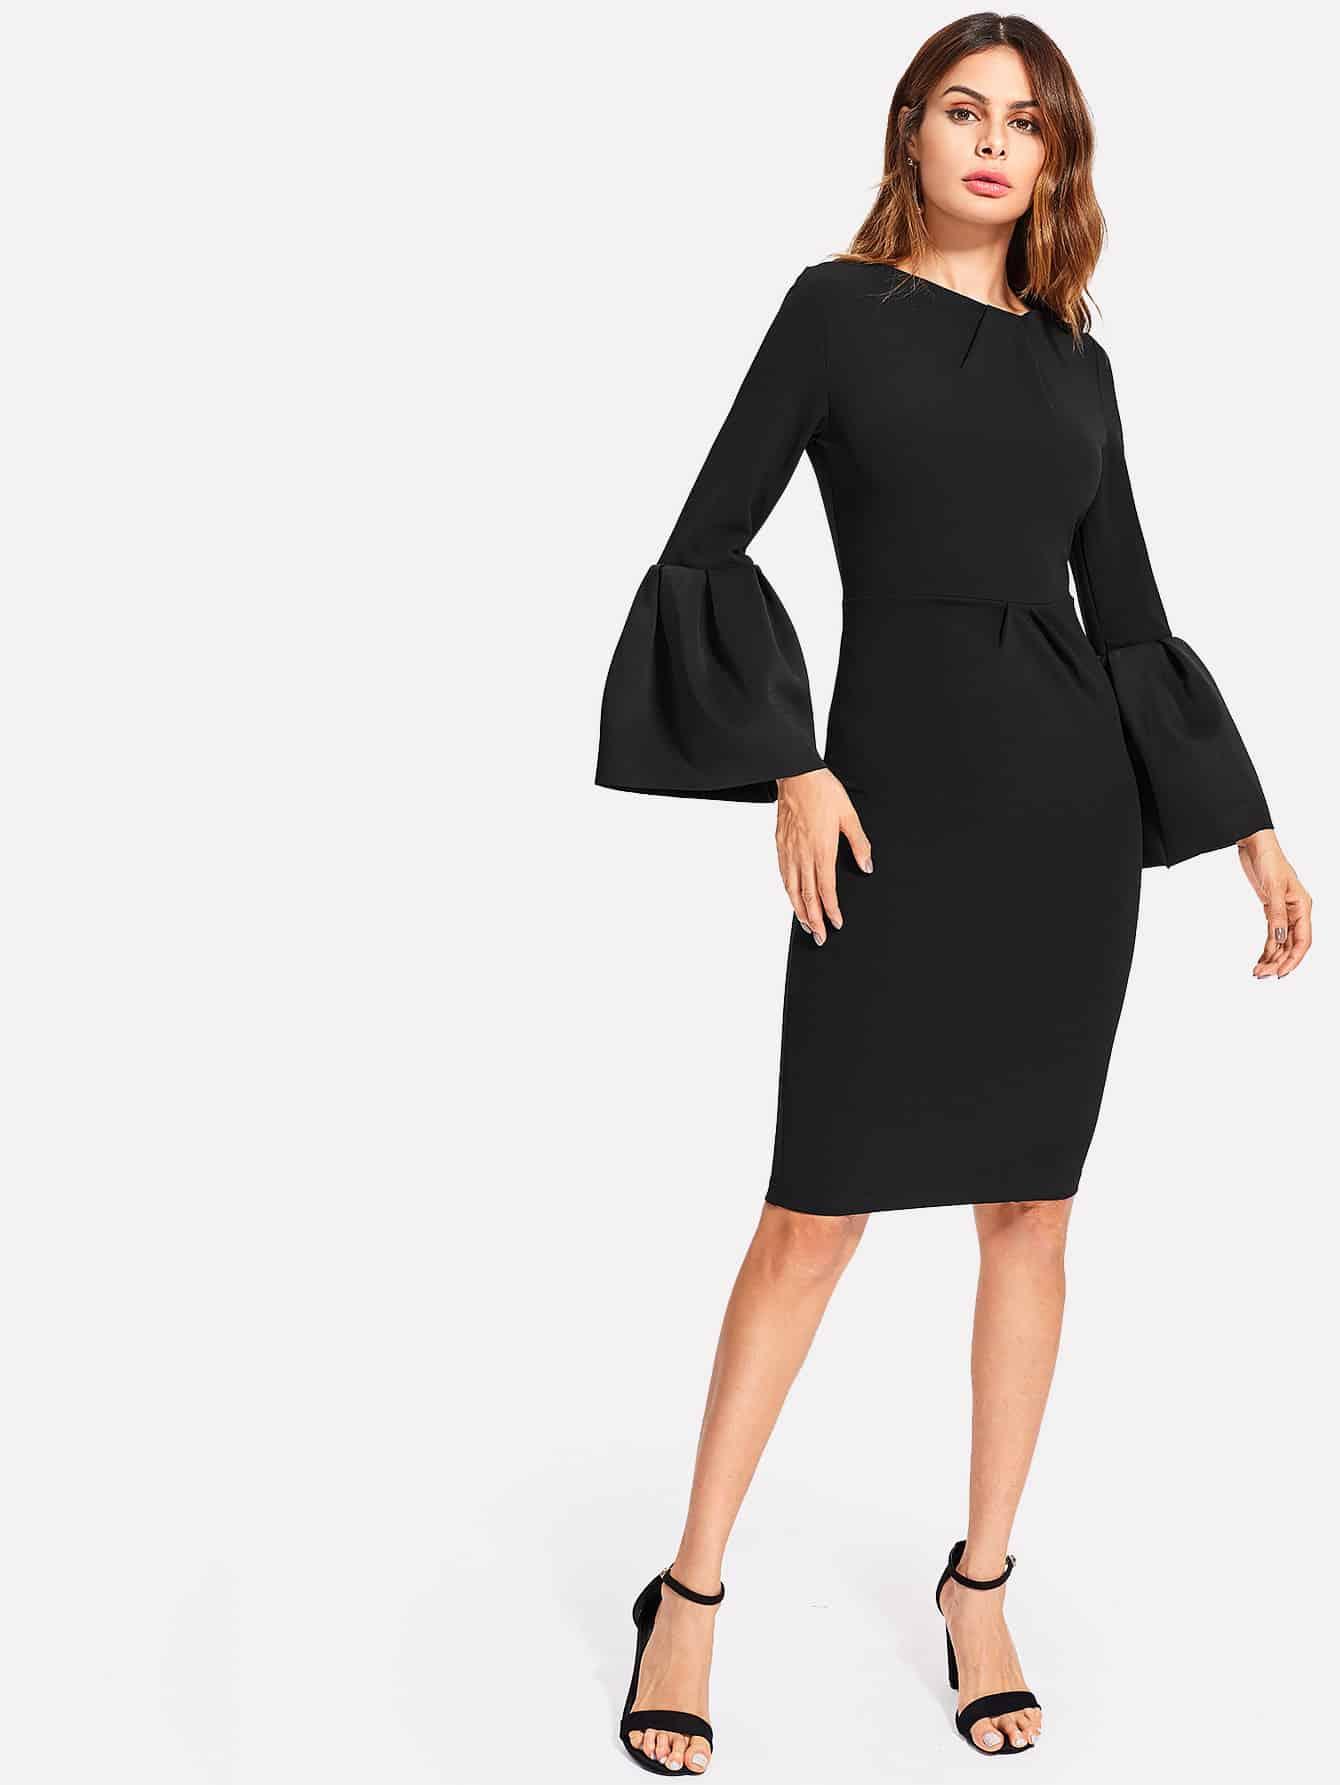 Pleat Detail Bell Sleeve Skinny Dress box pleat detail palazzo pants